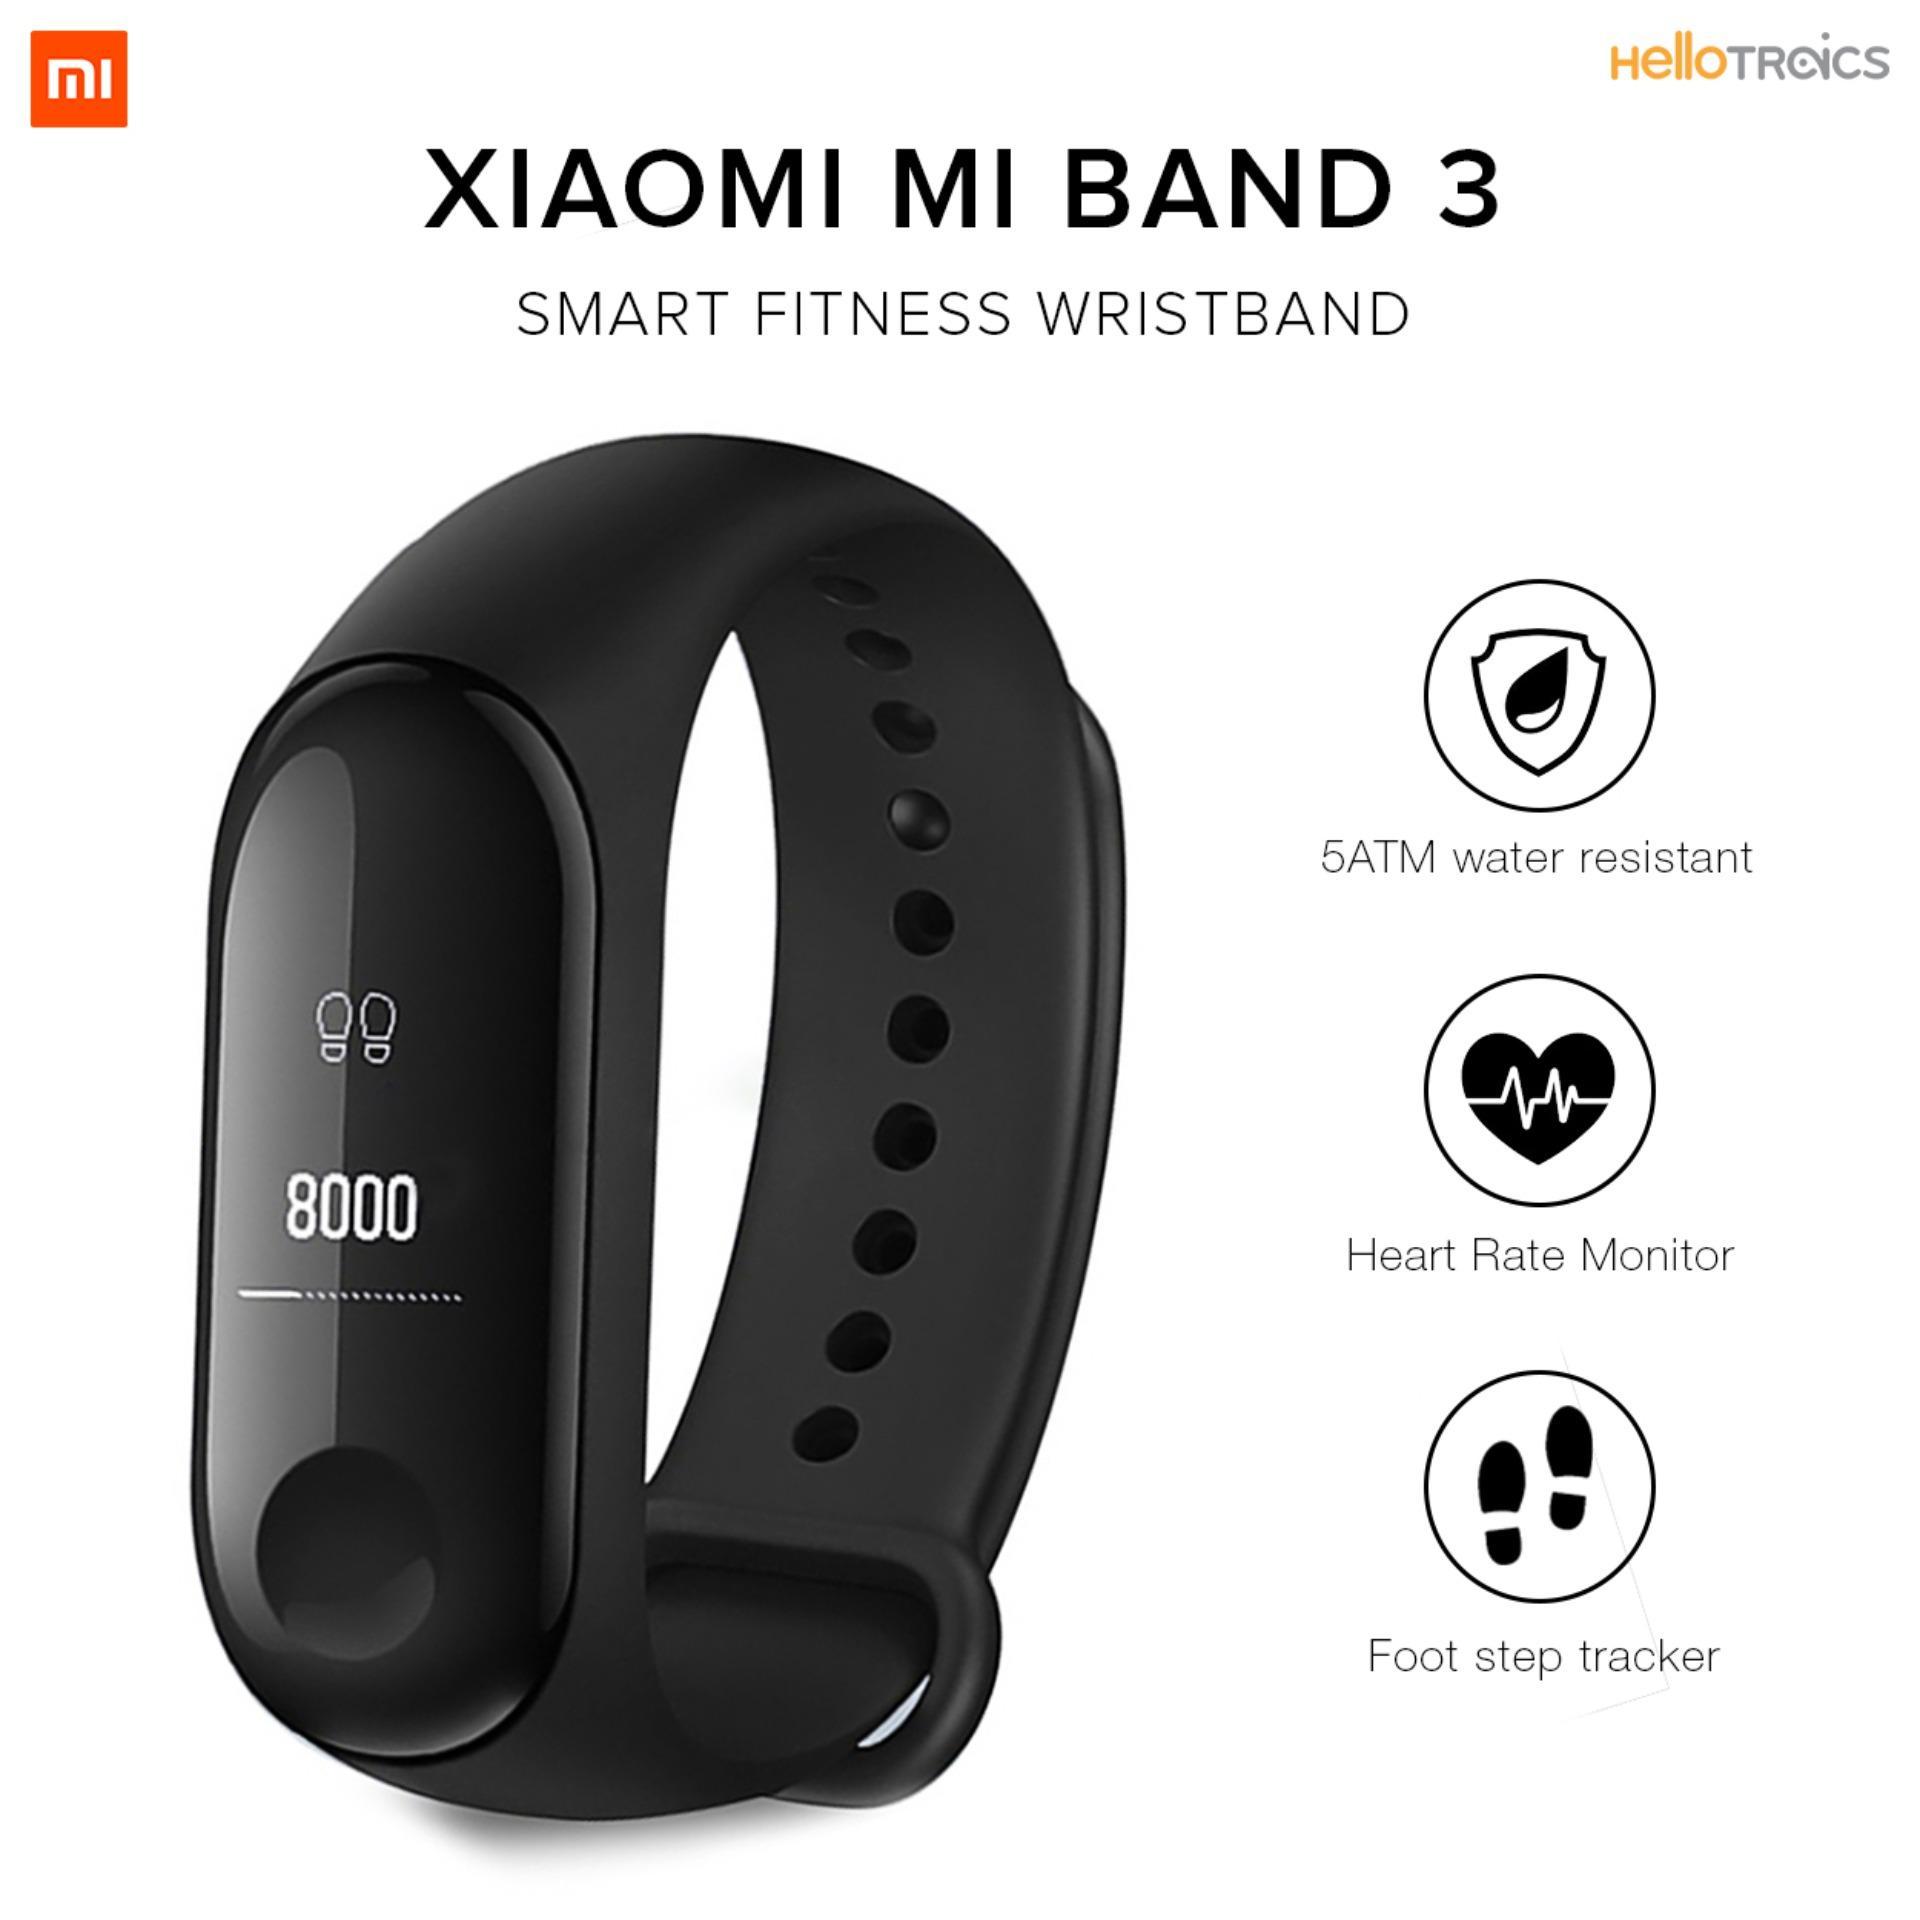 Xiaomi Mi Band v 3 Digital Smart Band Heart Rate Monitor Fitness Black